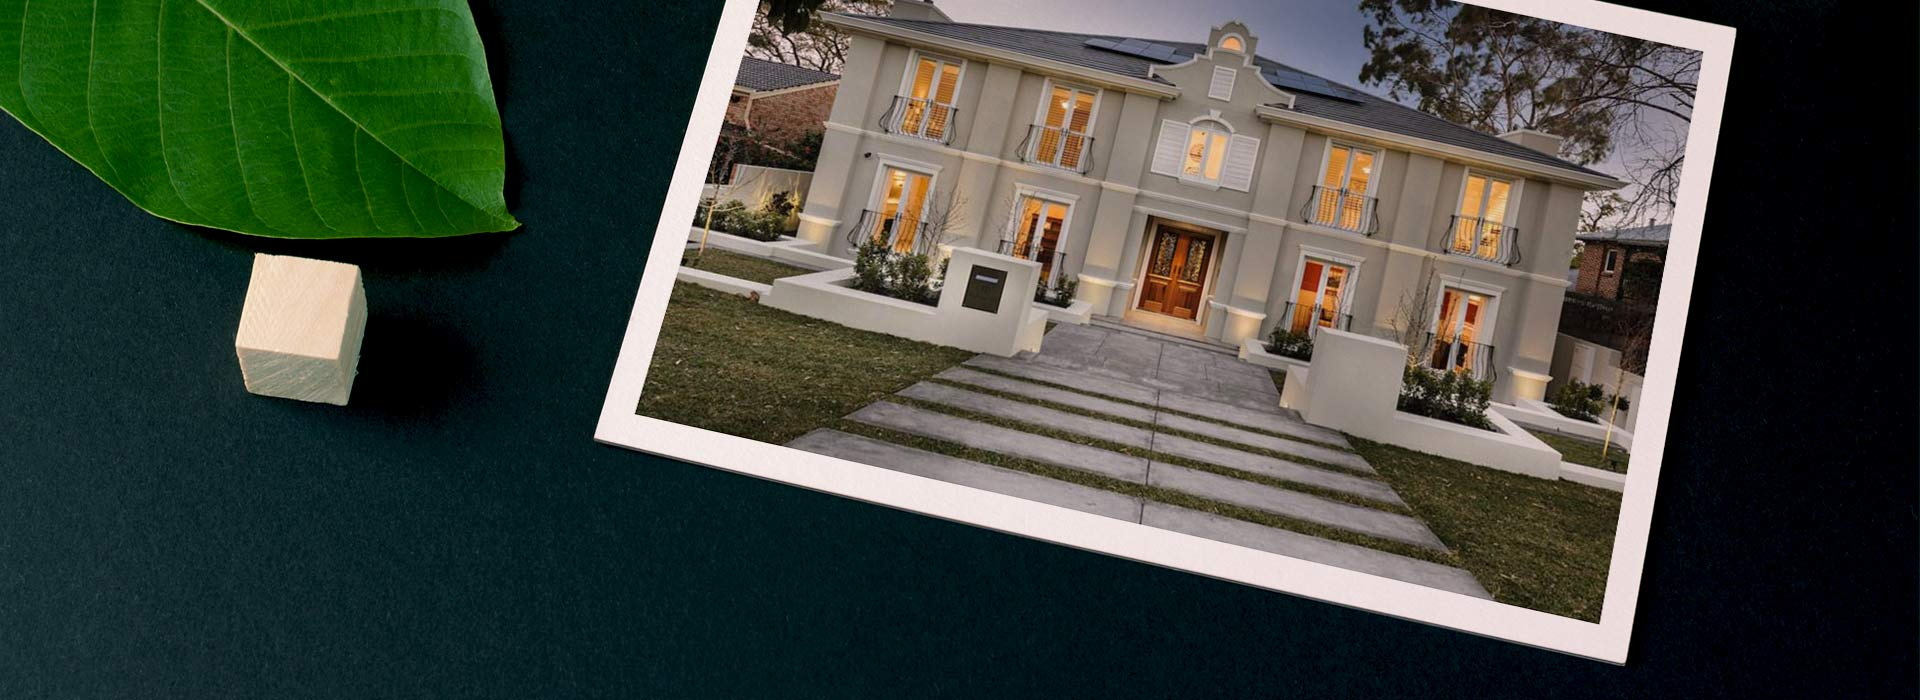 French Provincial house - چه سبک معماری برای شما مناسب است ؟